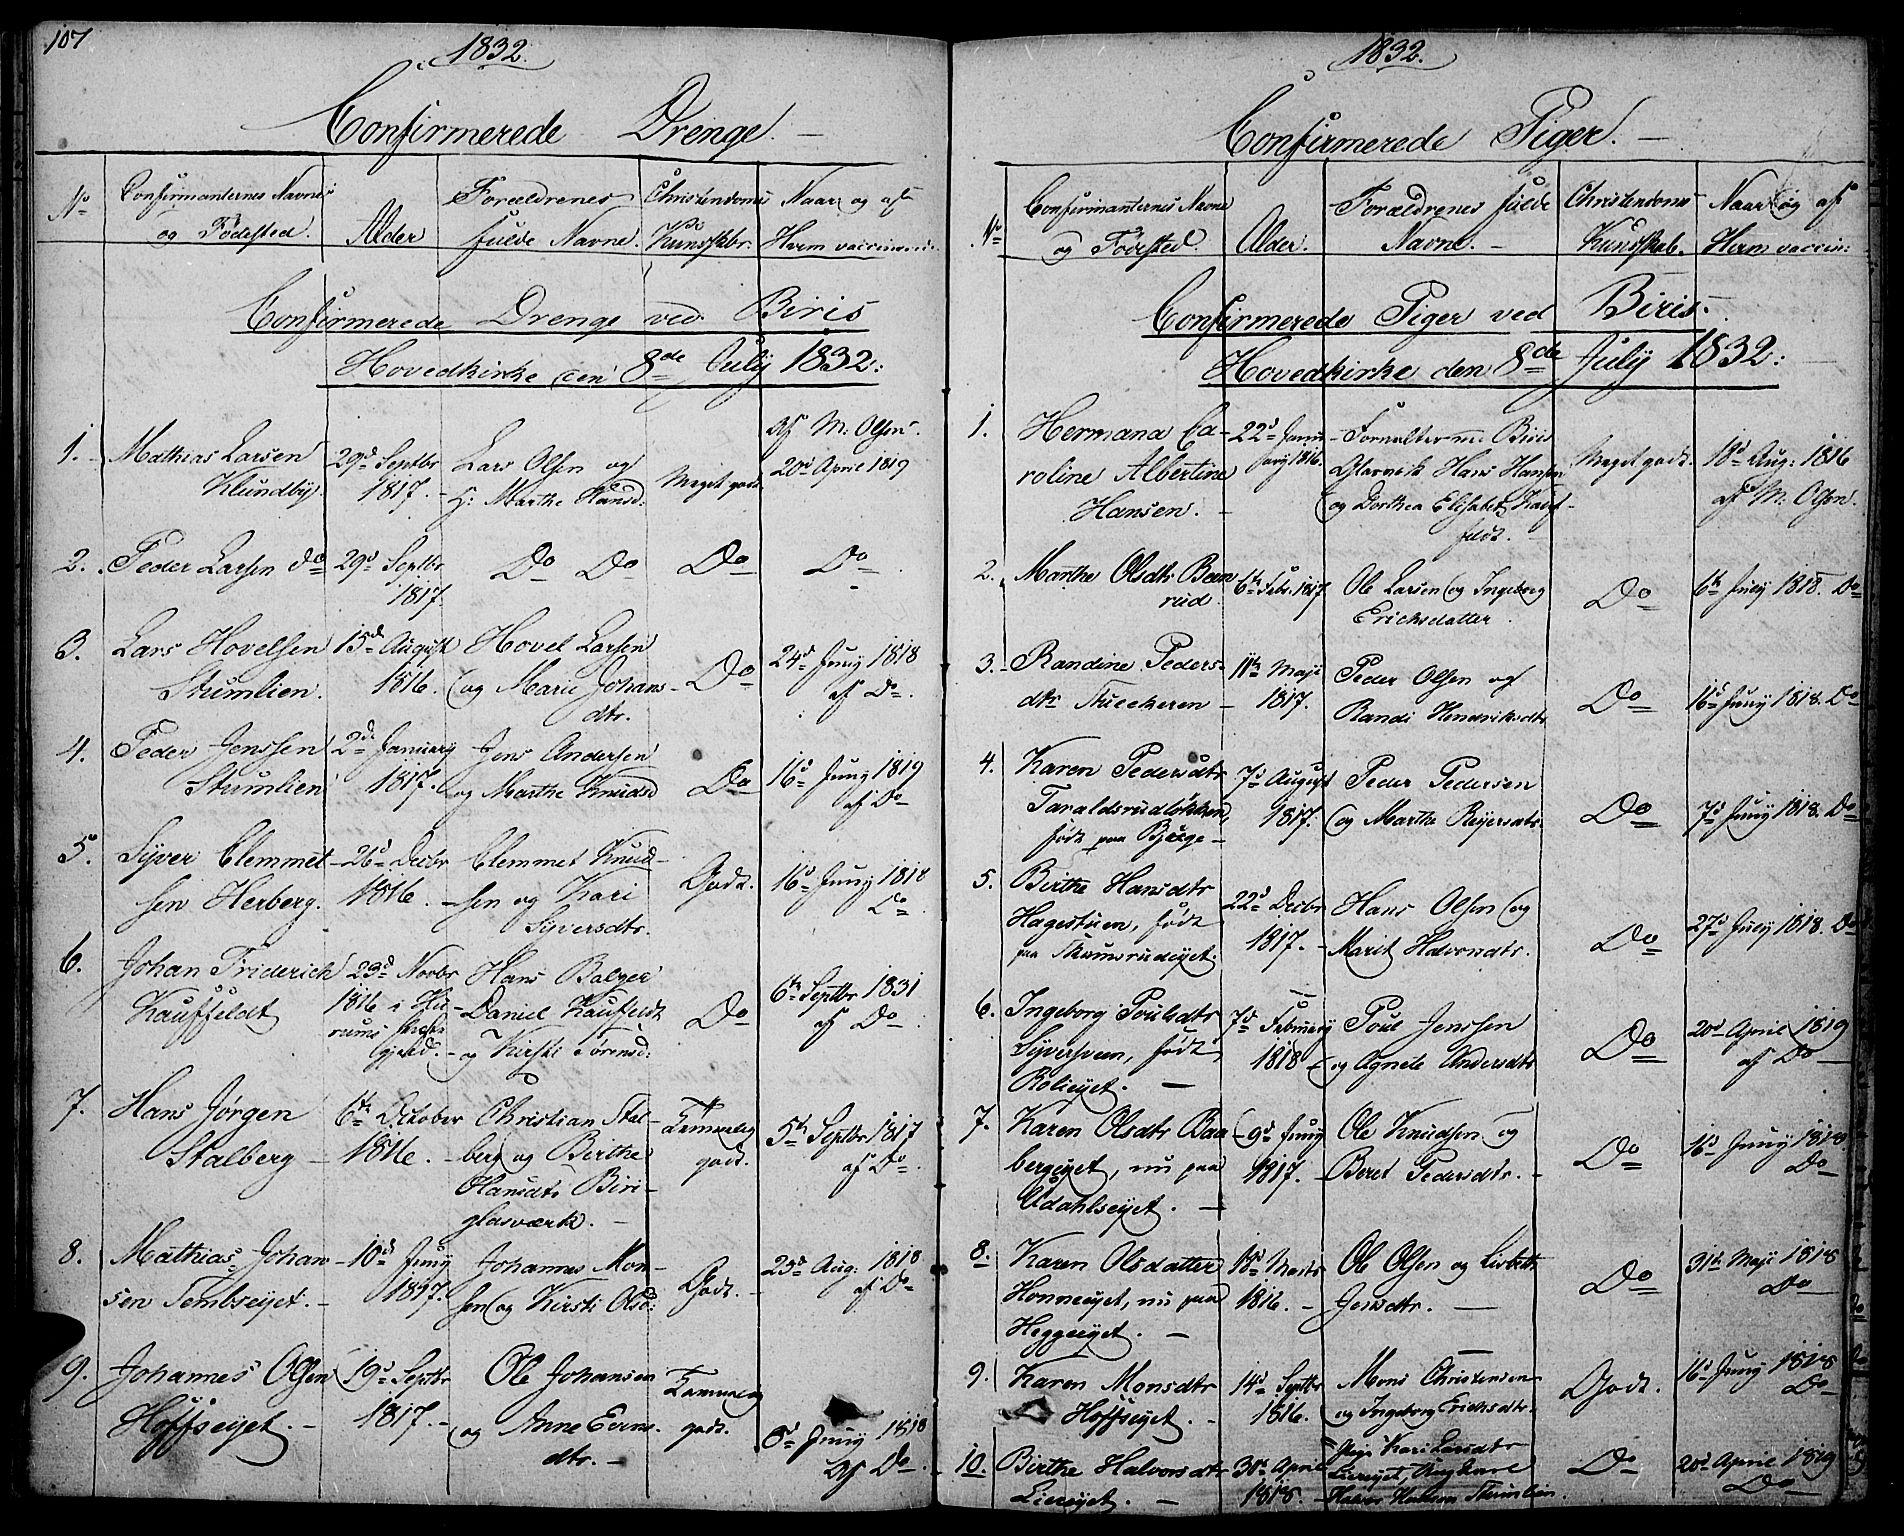 SAH, Biri prestekontor, Ministerialbok nr. 4, 1829-1842, s. 107